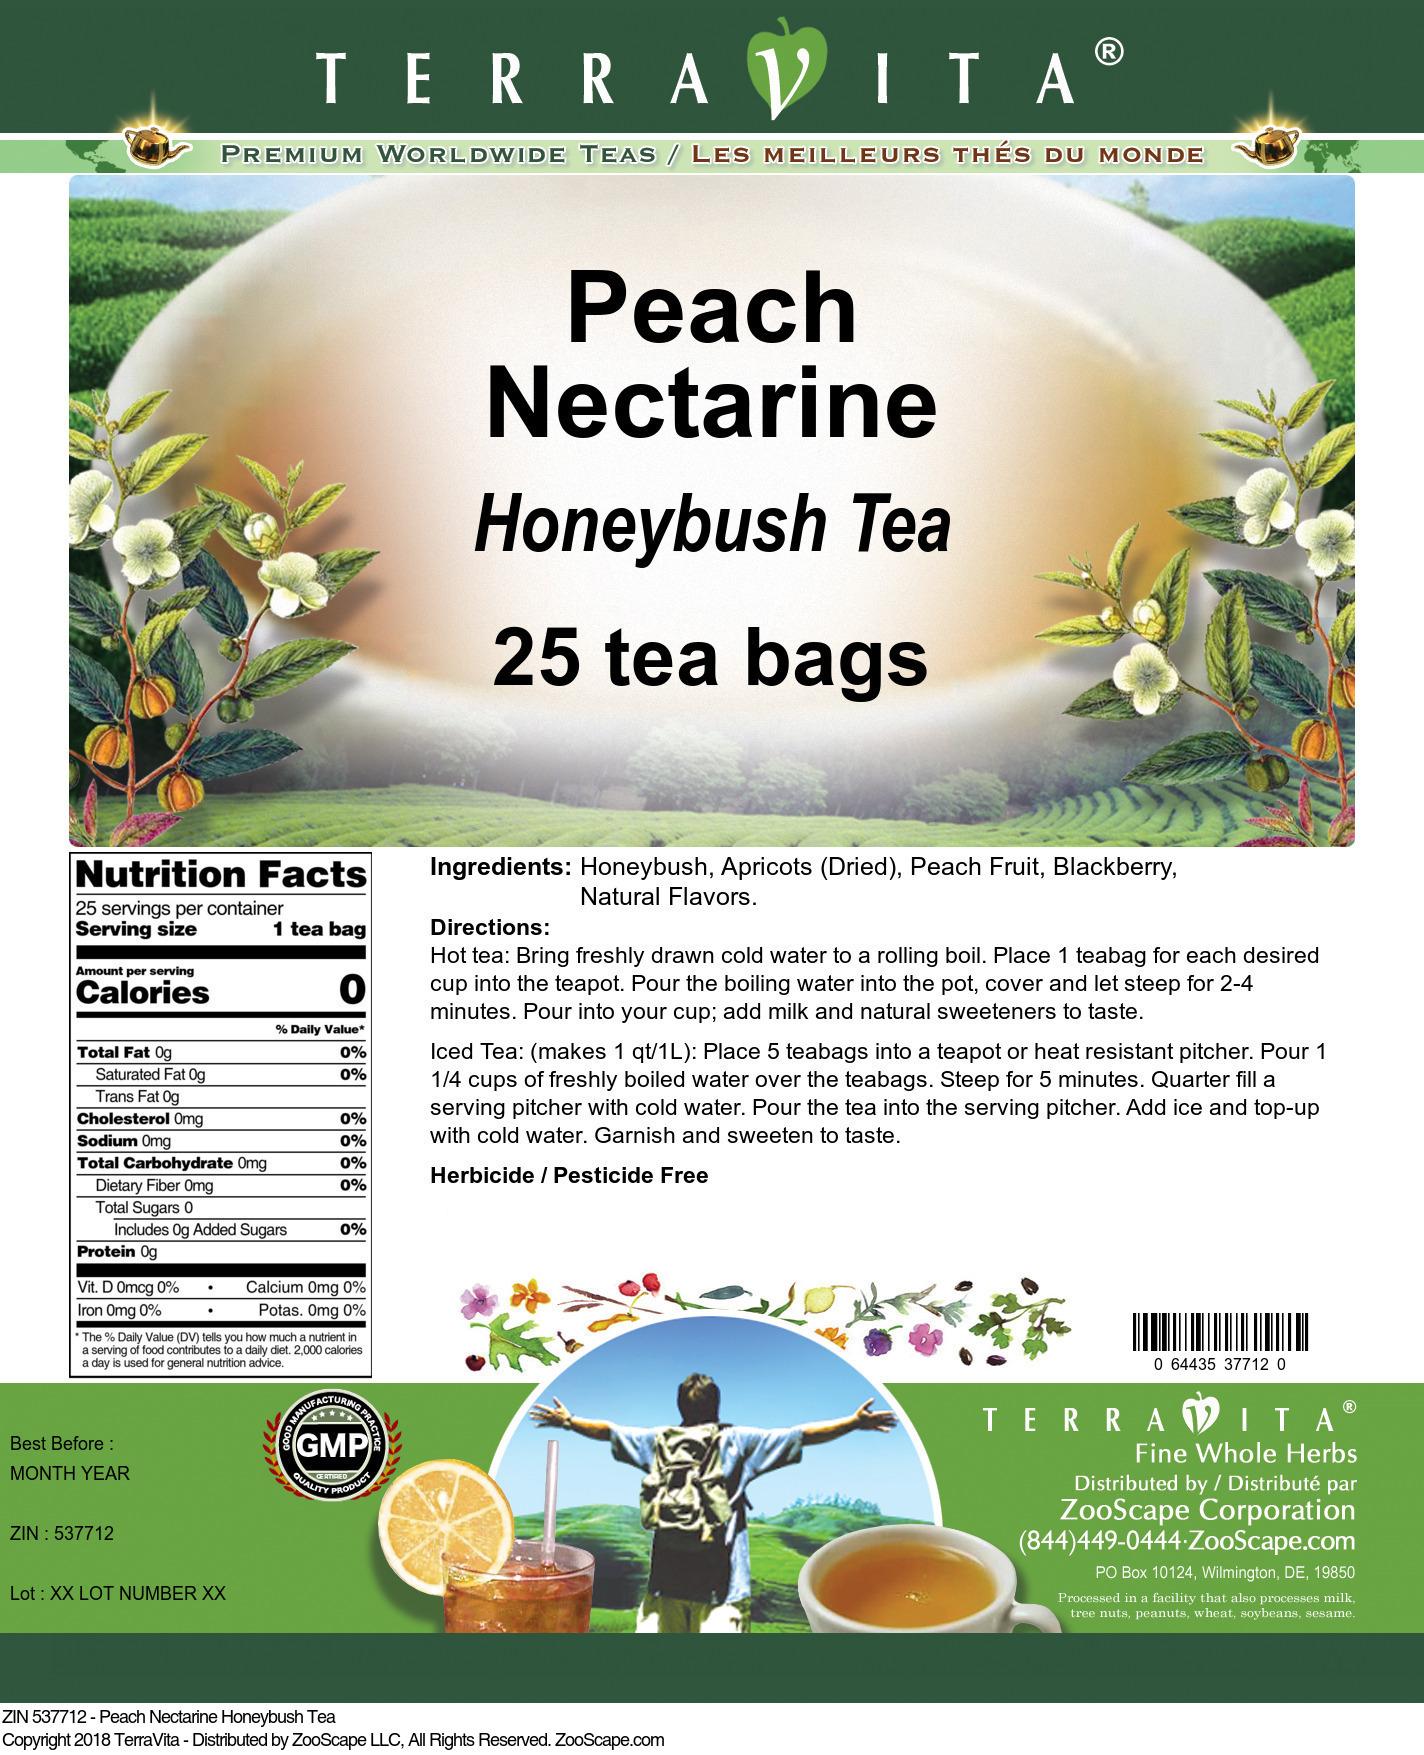 Peach Nectarine Honeybush Tea